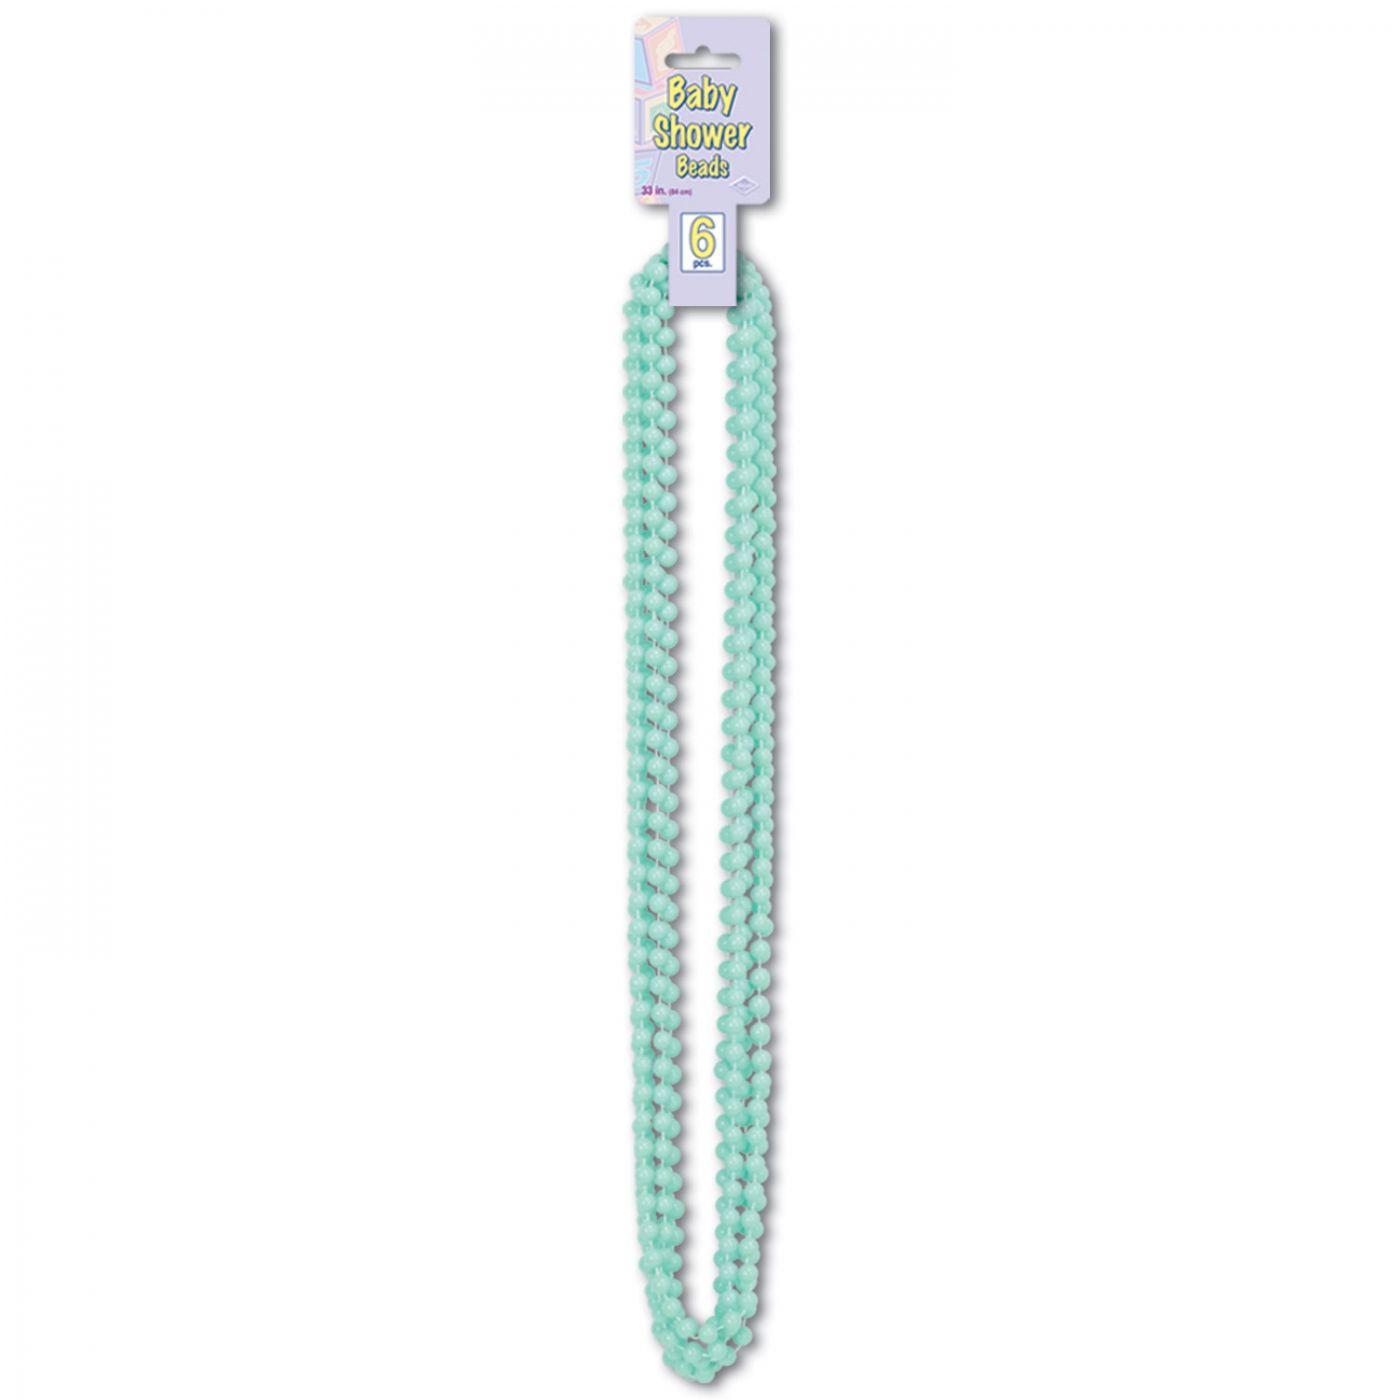 Baby Shower Beads image